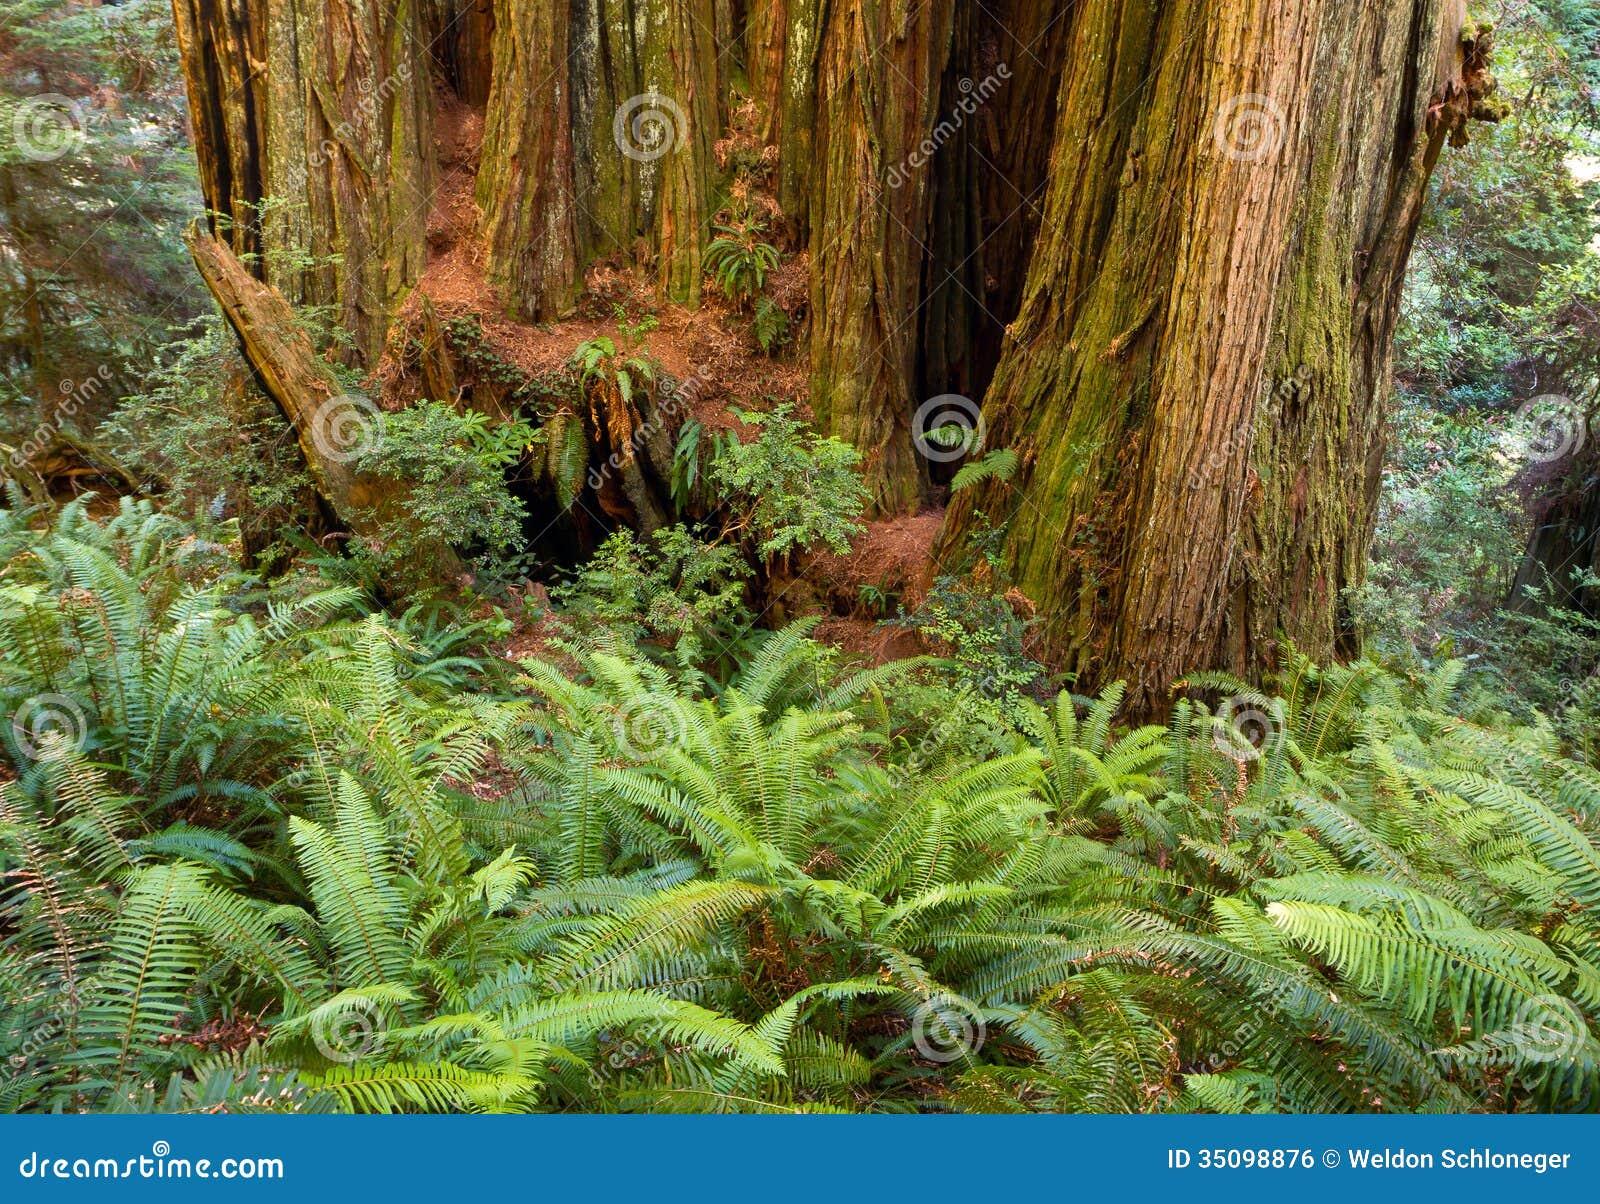 Trunk of California redwood tree among ferns